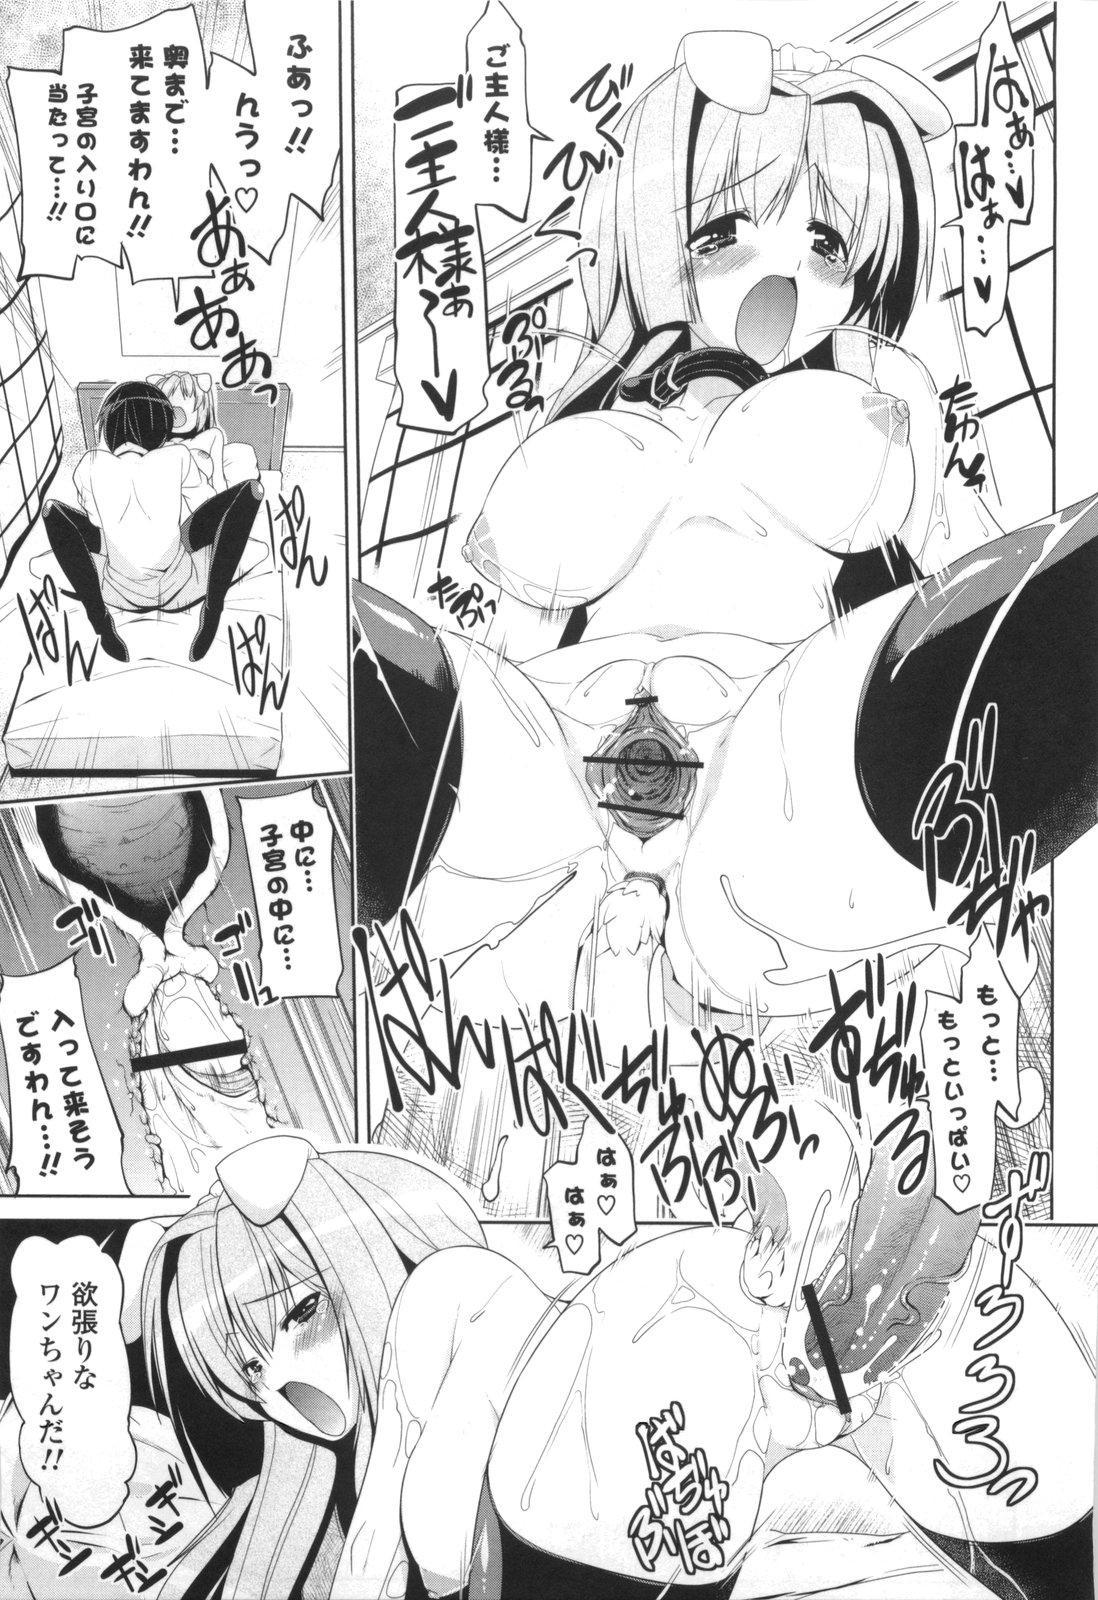 [Gyonikun] Gosyujin-sama Senyou!? Ami-sama Senyou 26